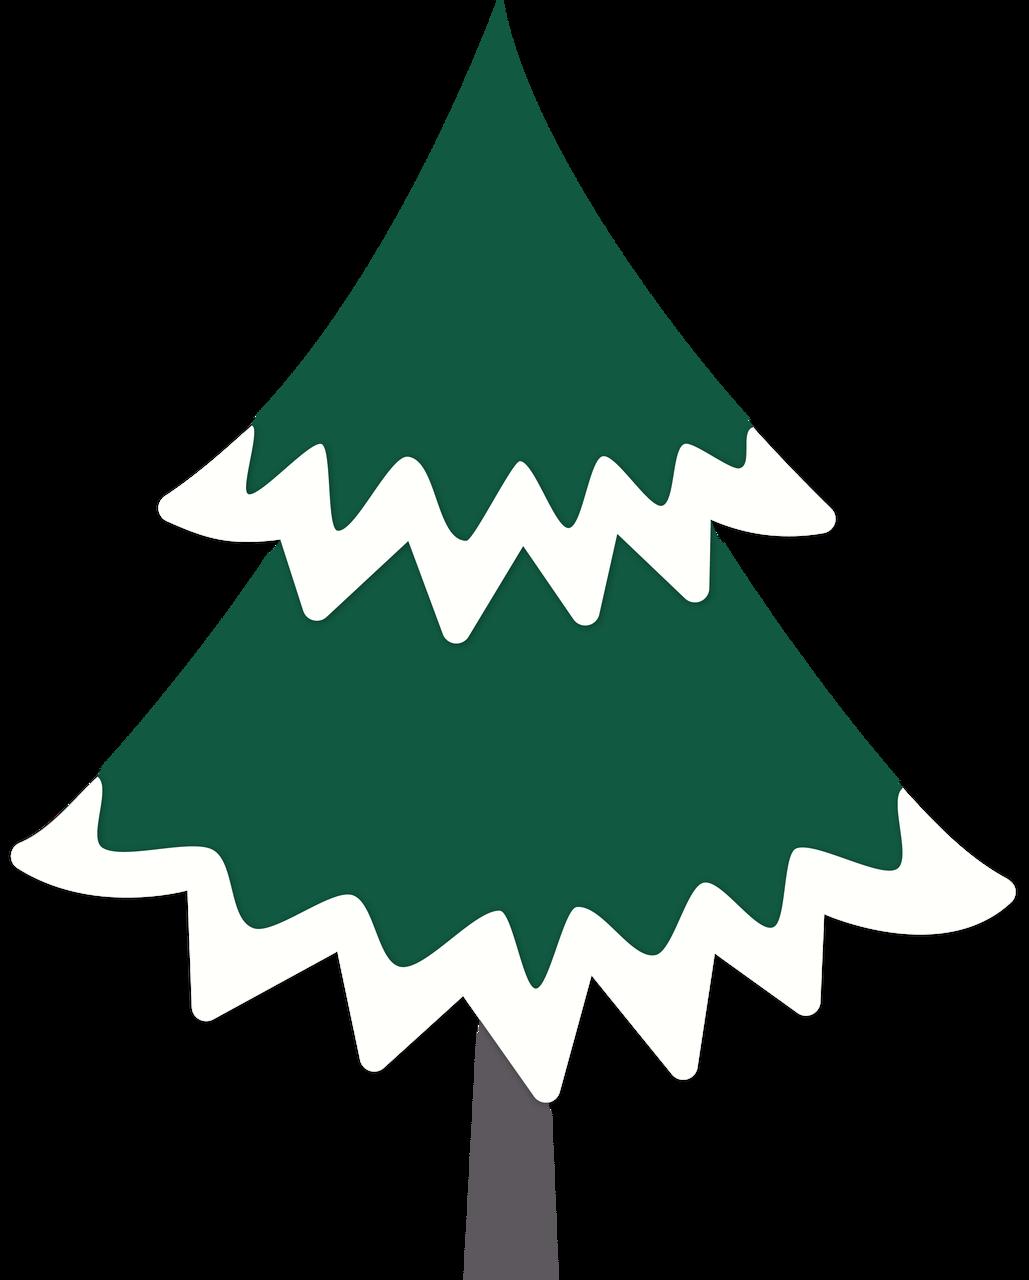 Christmas Tree SVG Cut File